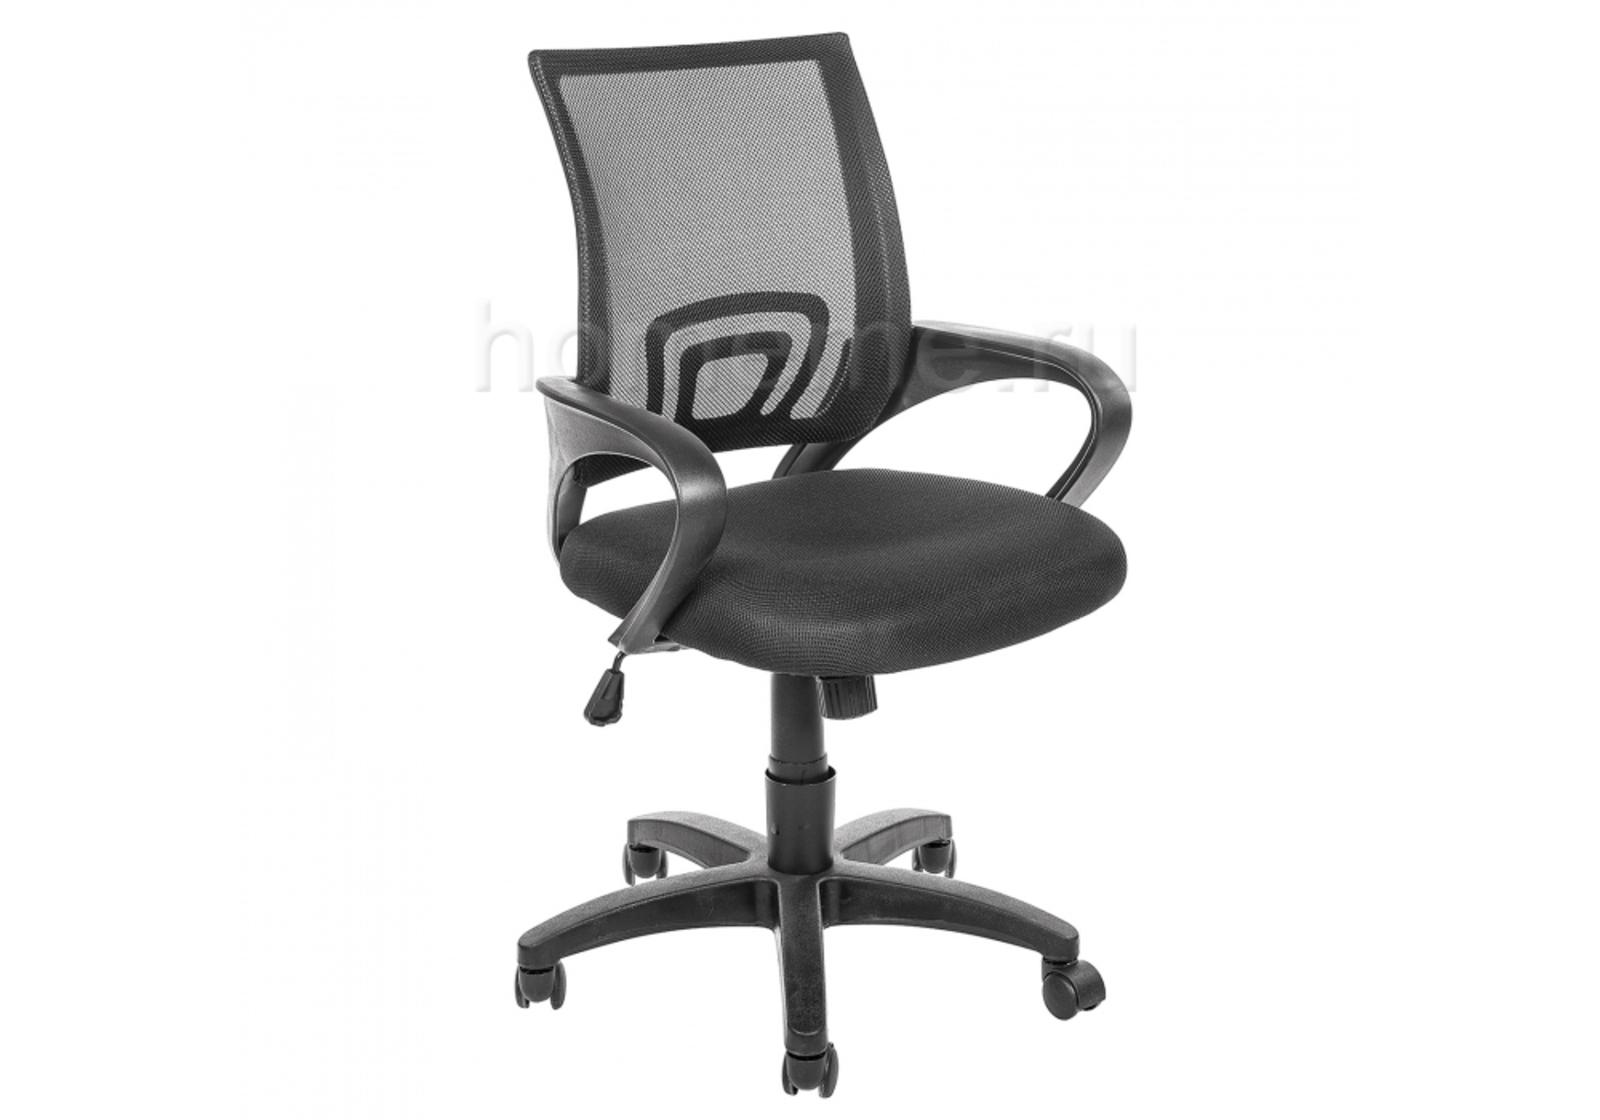 Кресло для офиса HomeMe Turin черное 1478 от Homeme.ru